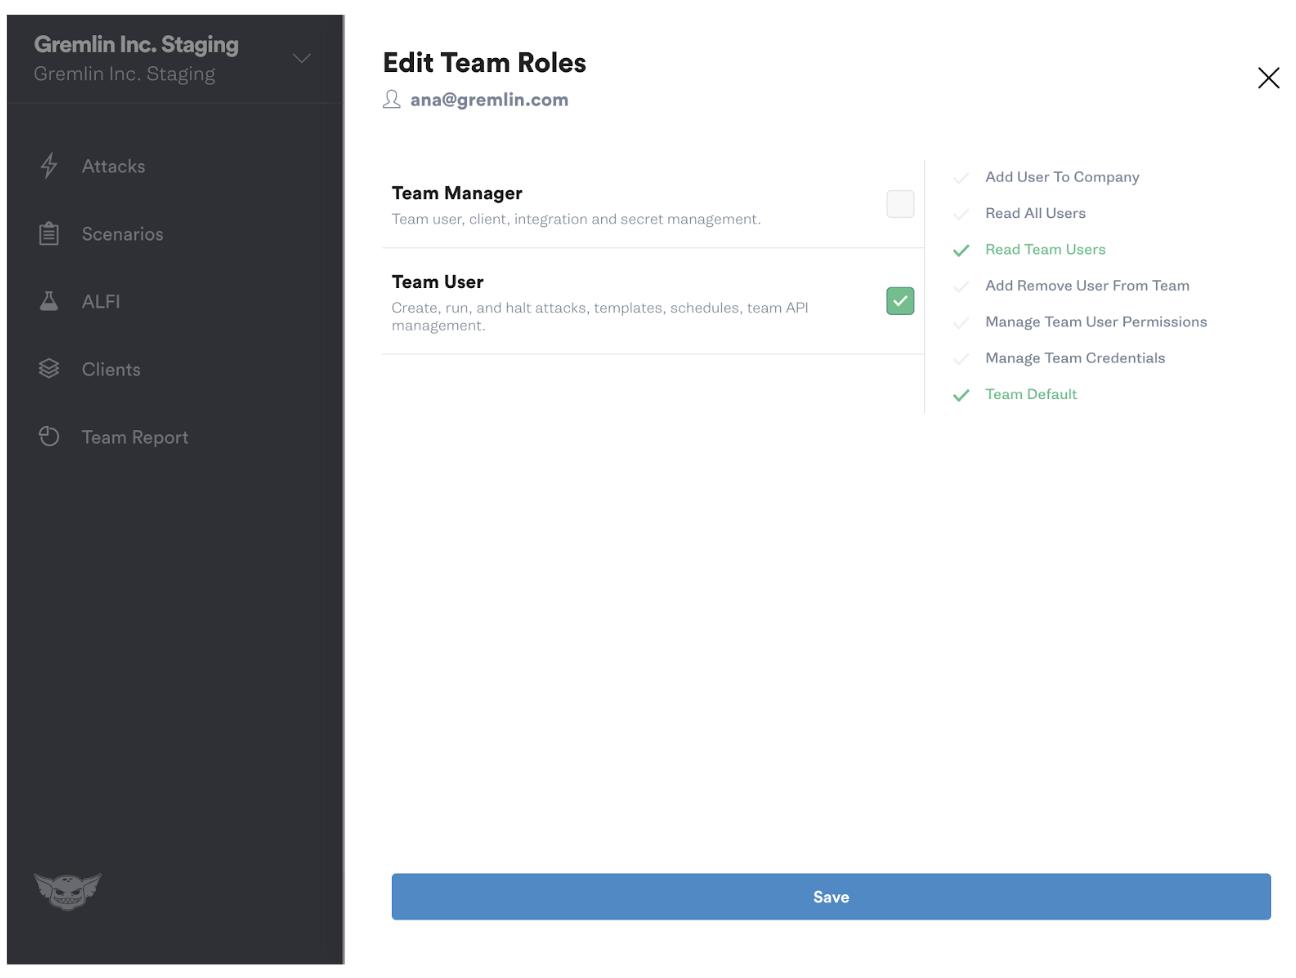 gremlin rbac edit team member roles